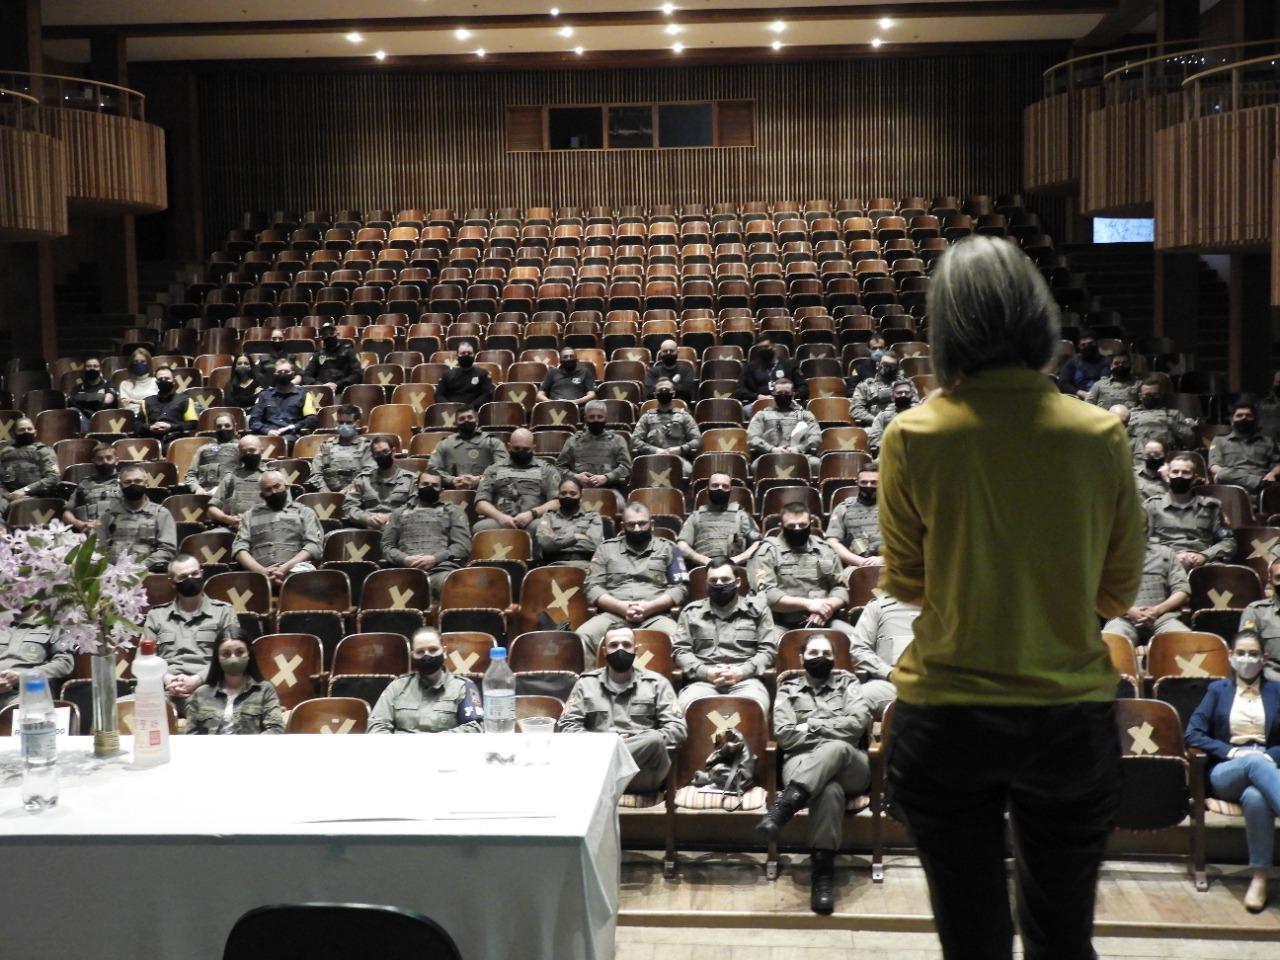 3º BPAT promove palestra alusiva ao Setembro Amarelo em Bento